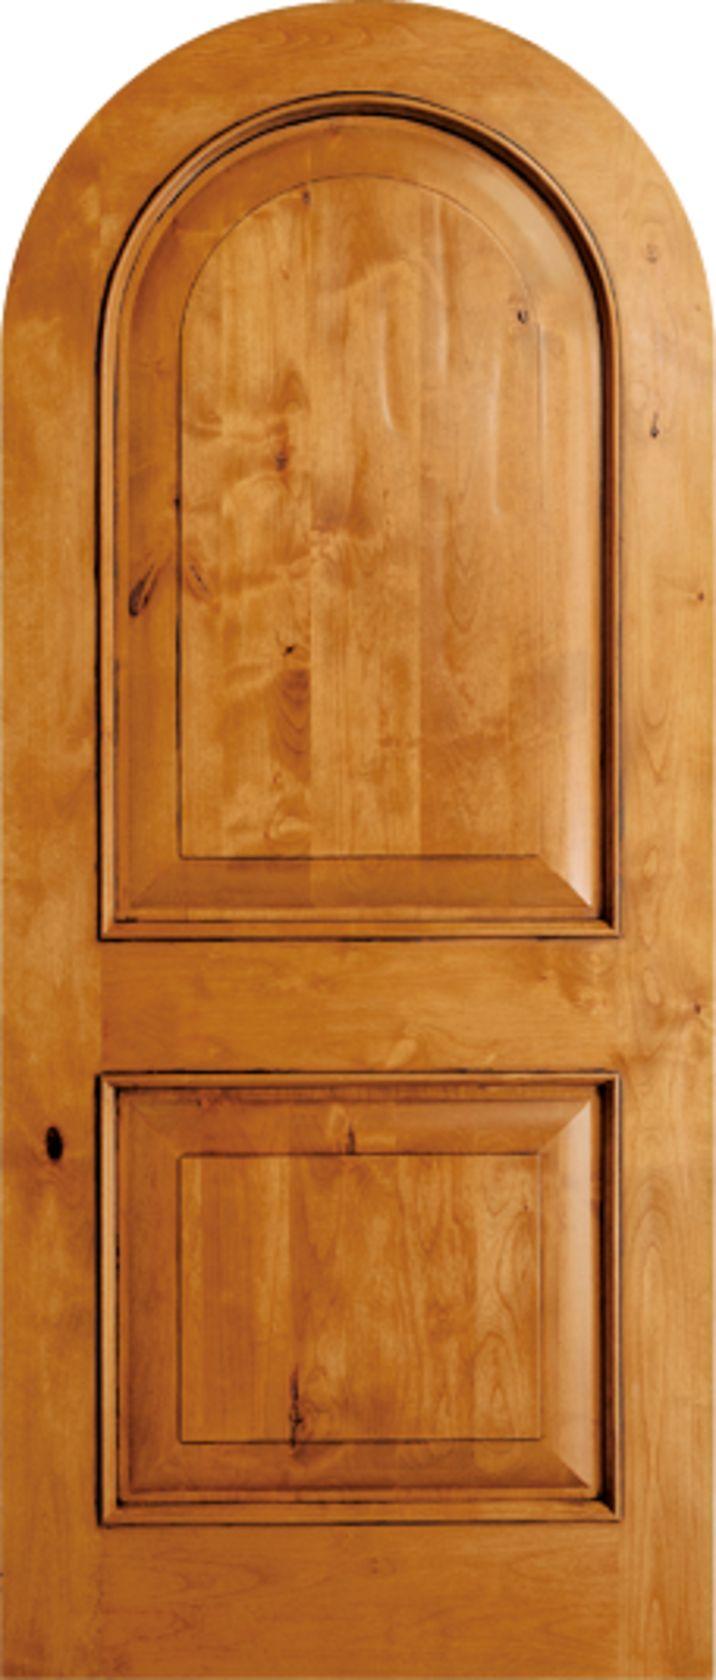 Best 25 custom interior doors ideas on pinterest wooden for All wood interior doors